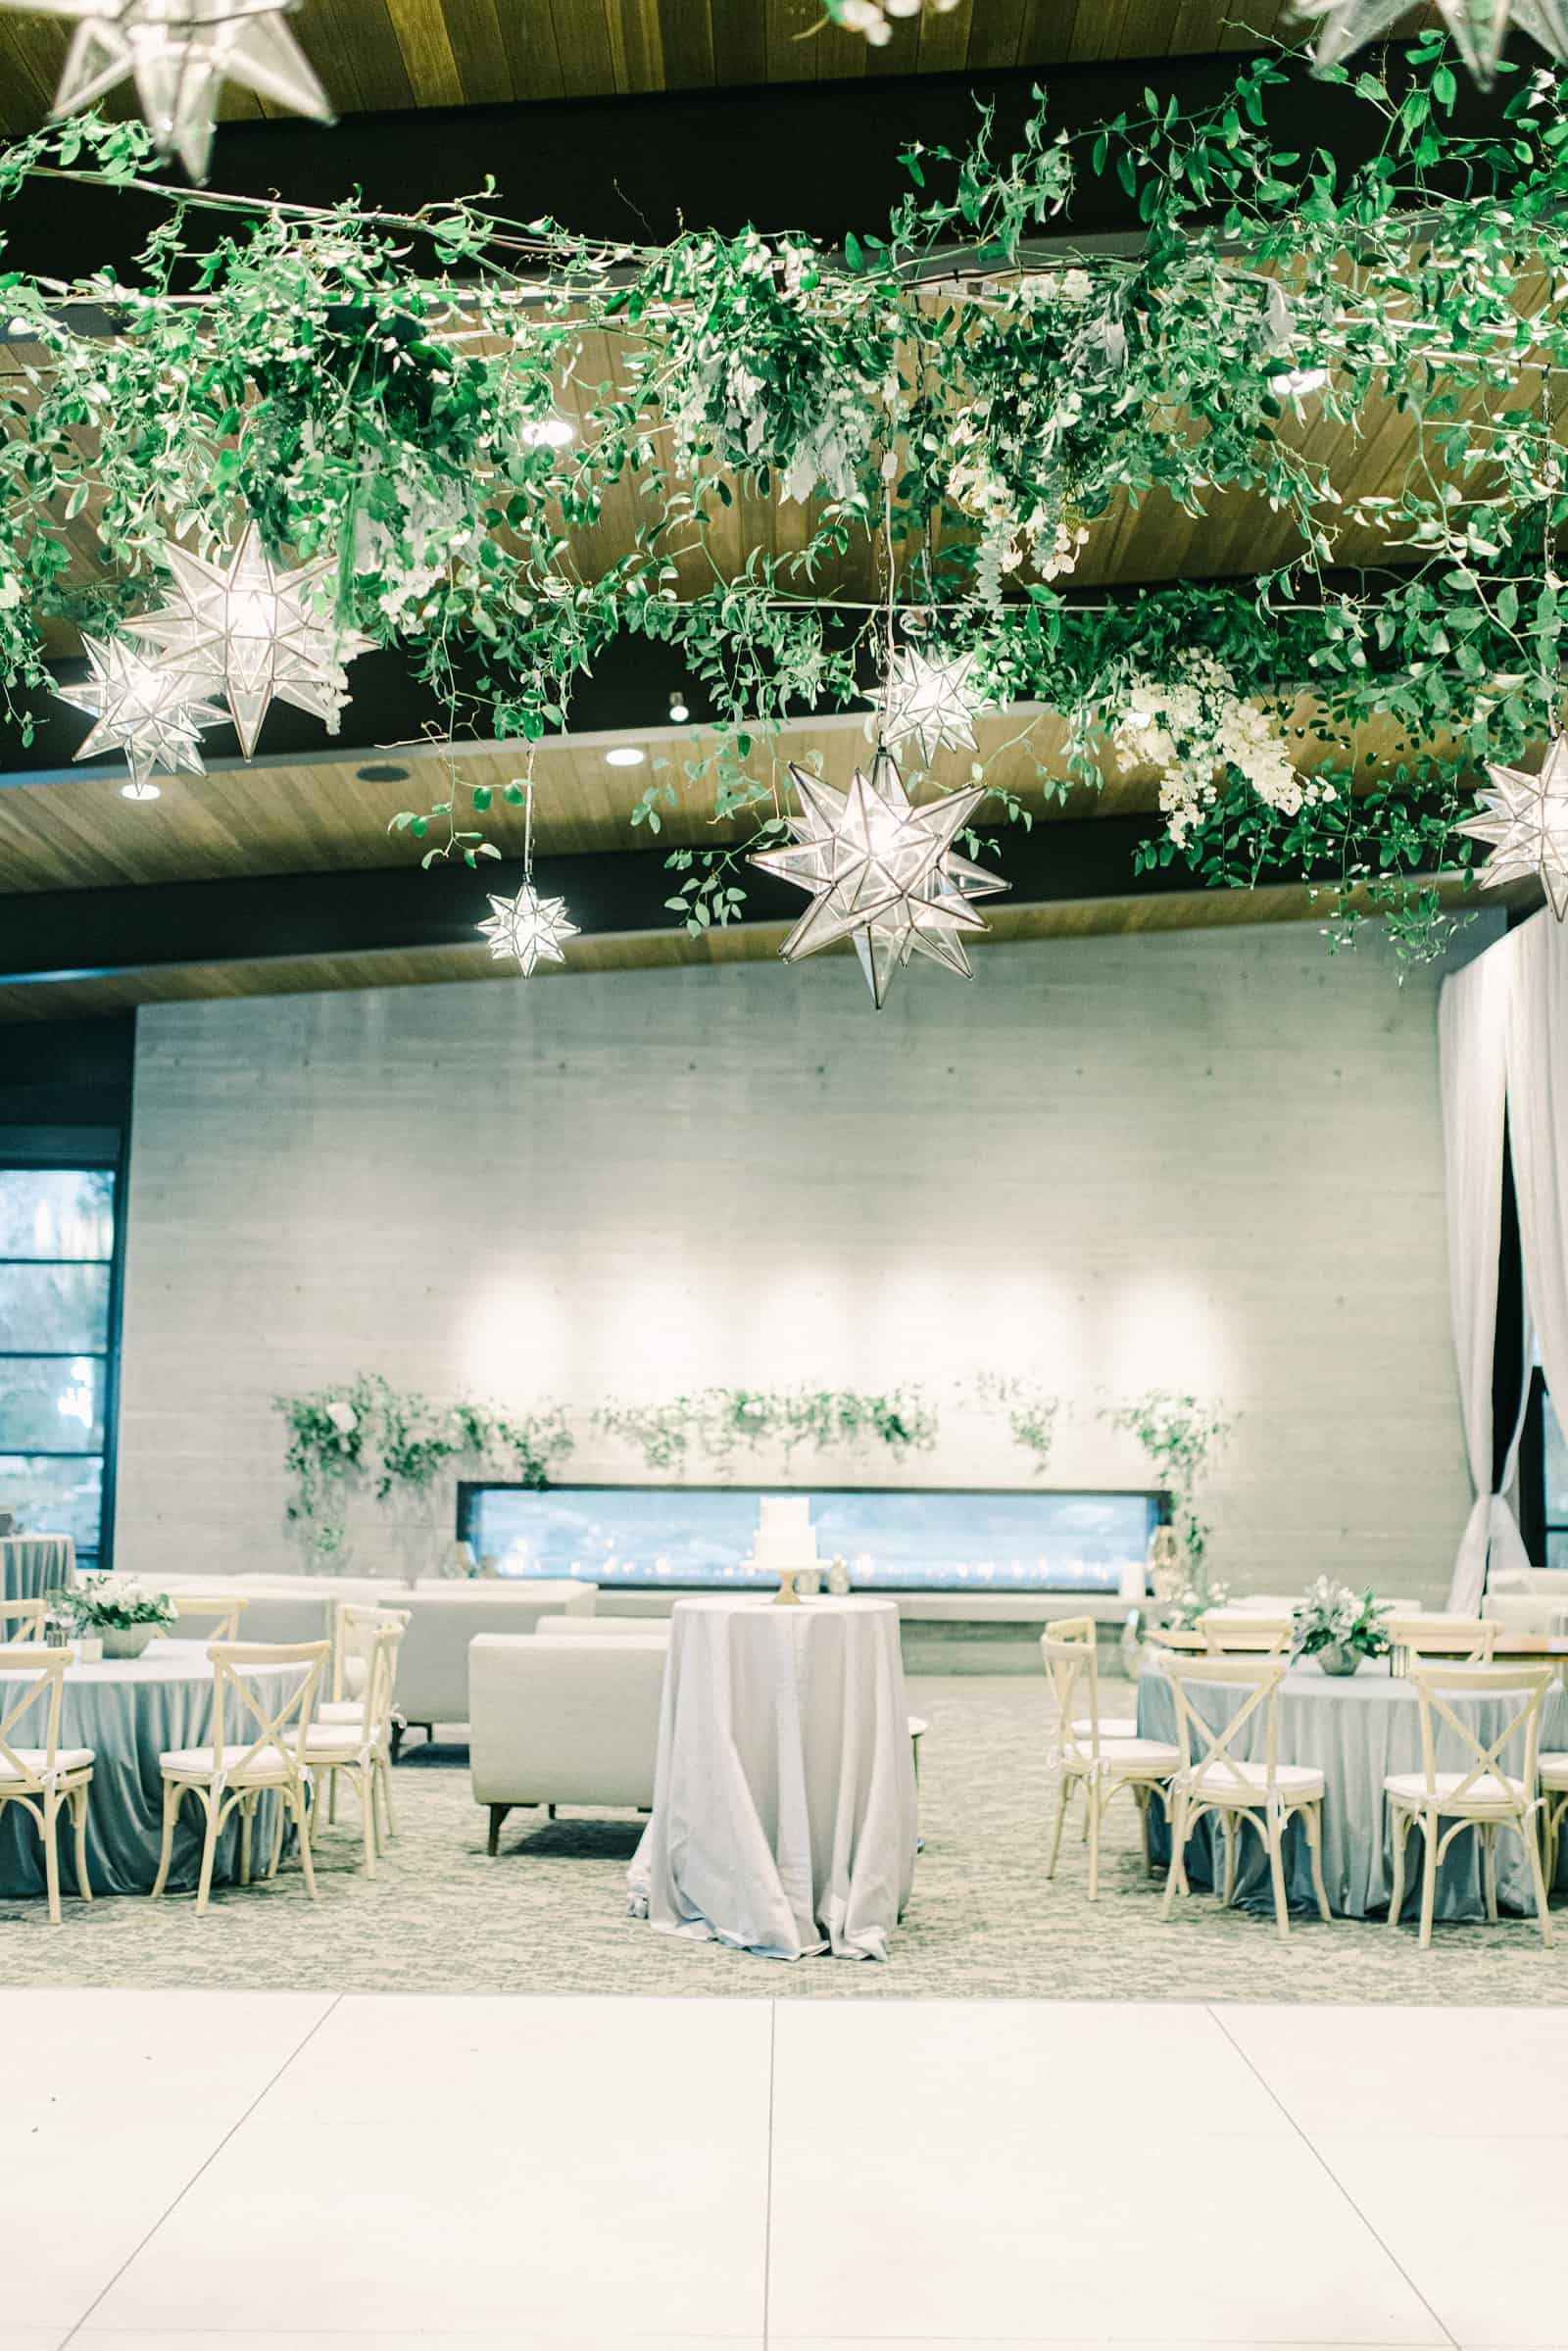 Winter wonderland wedding with star lanterns and ivy garlands, twinkle lights above dance floor